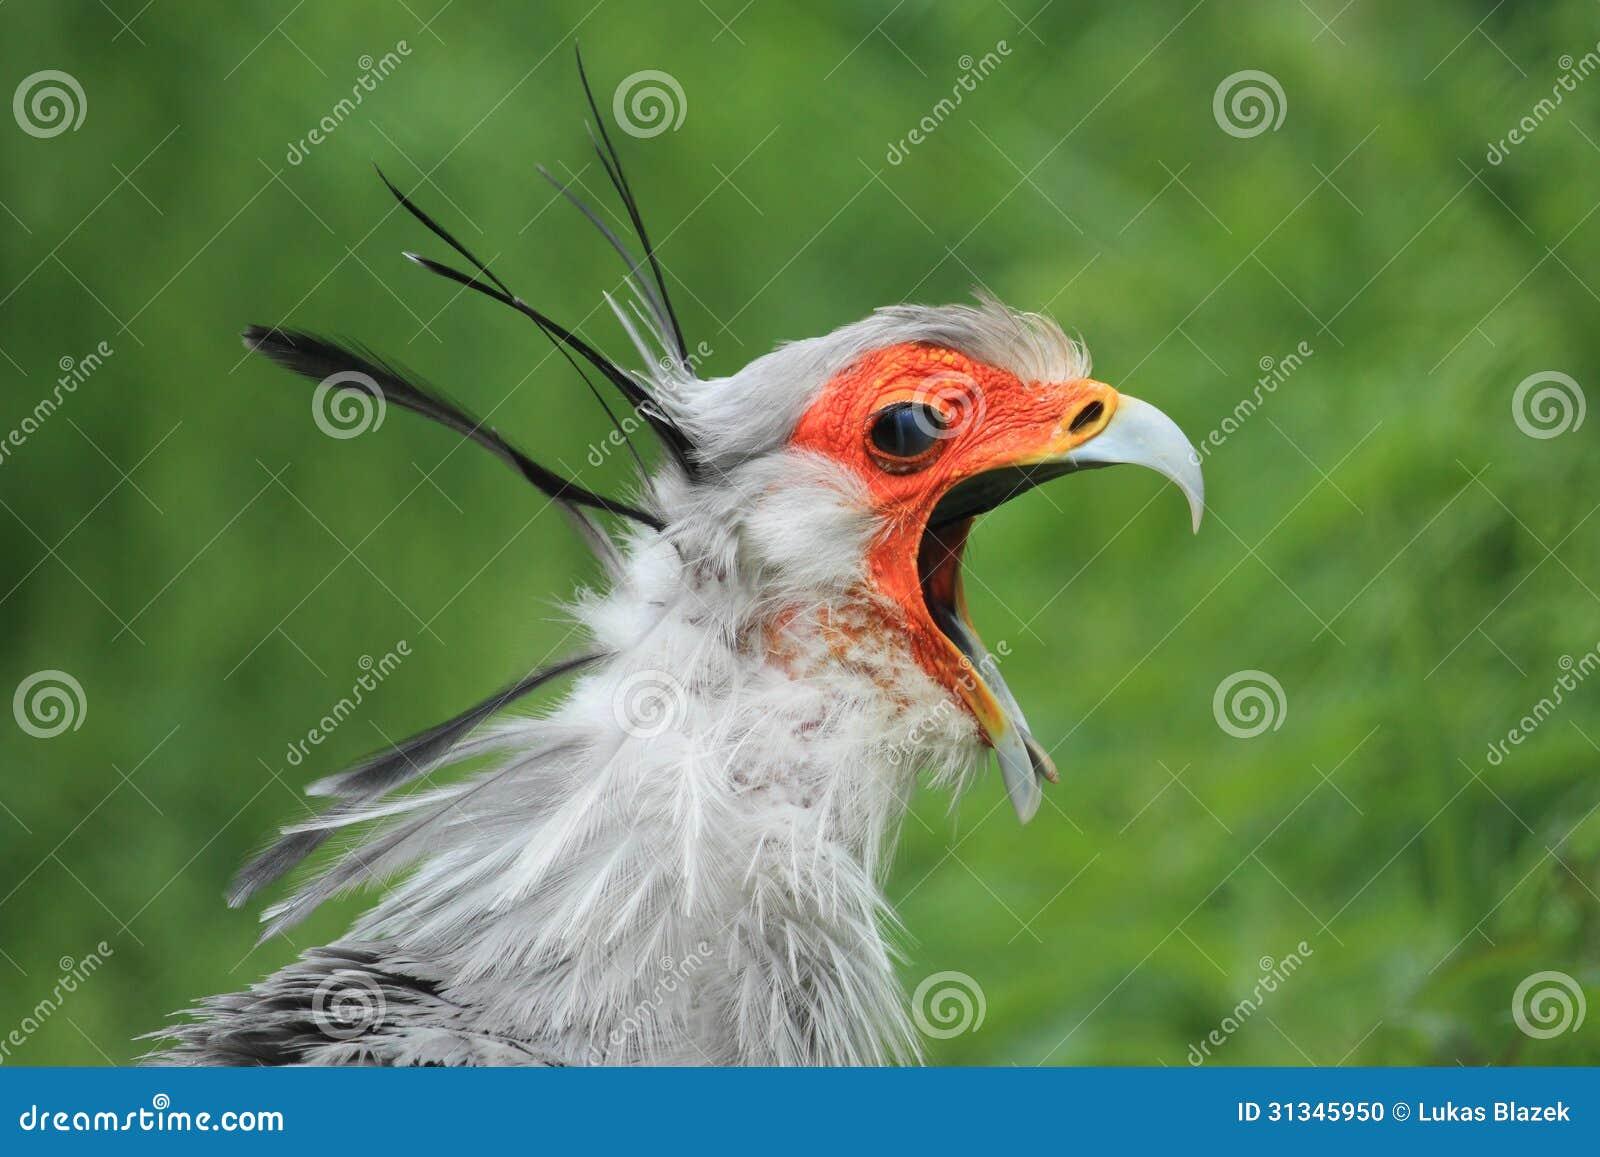 Screaming Secretary Bird Stock Photo - Image: 31345950